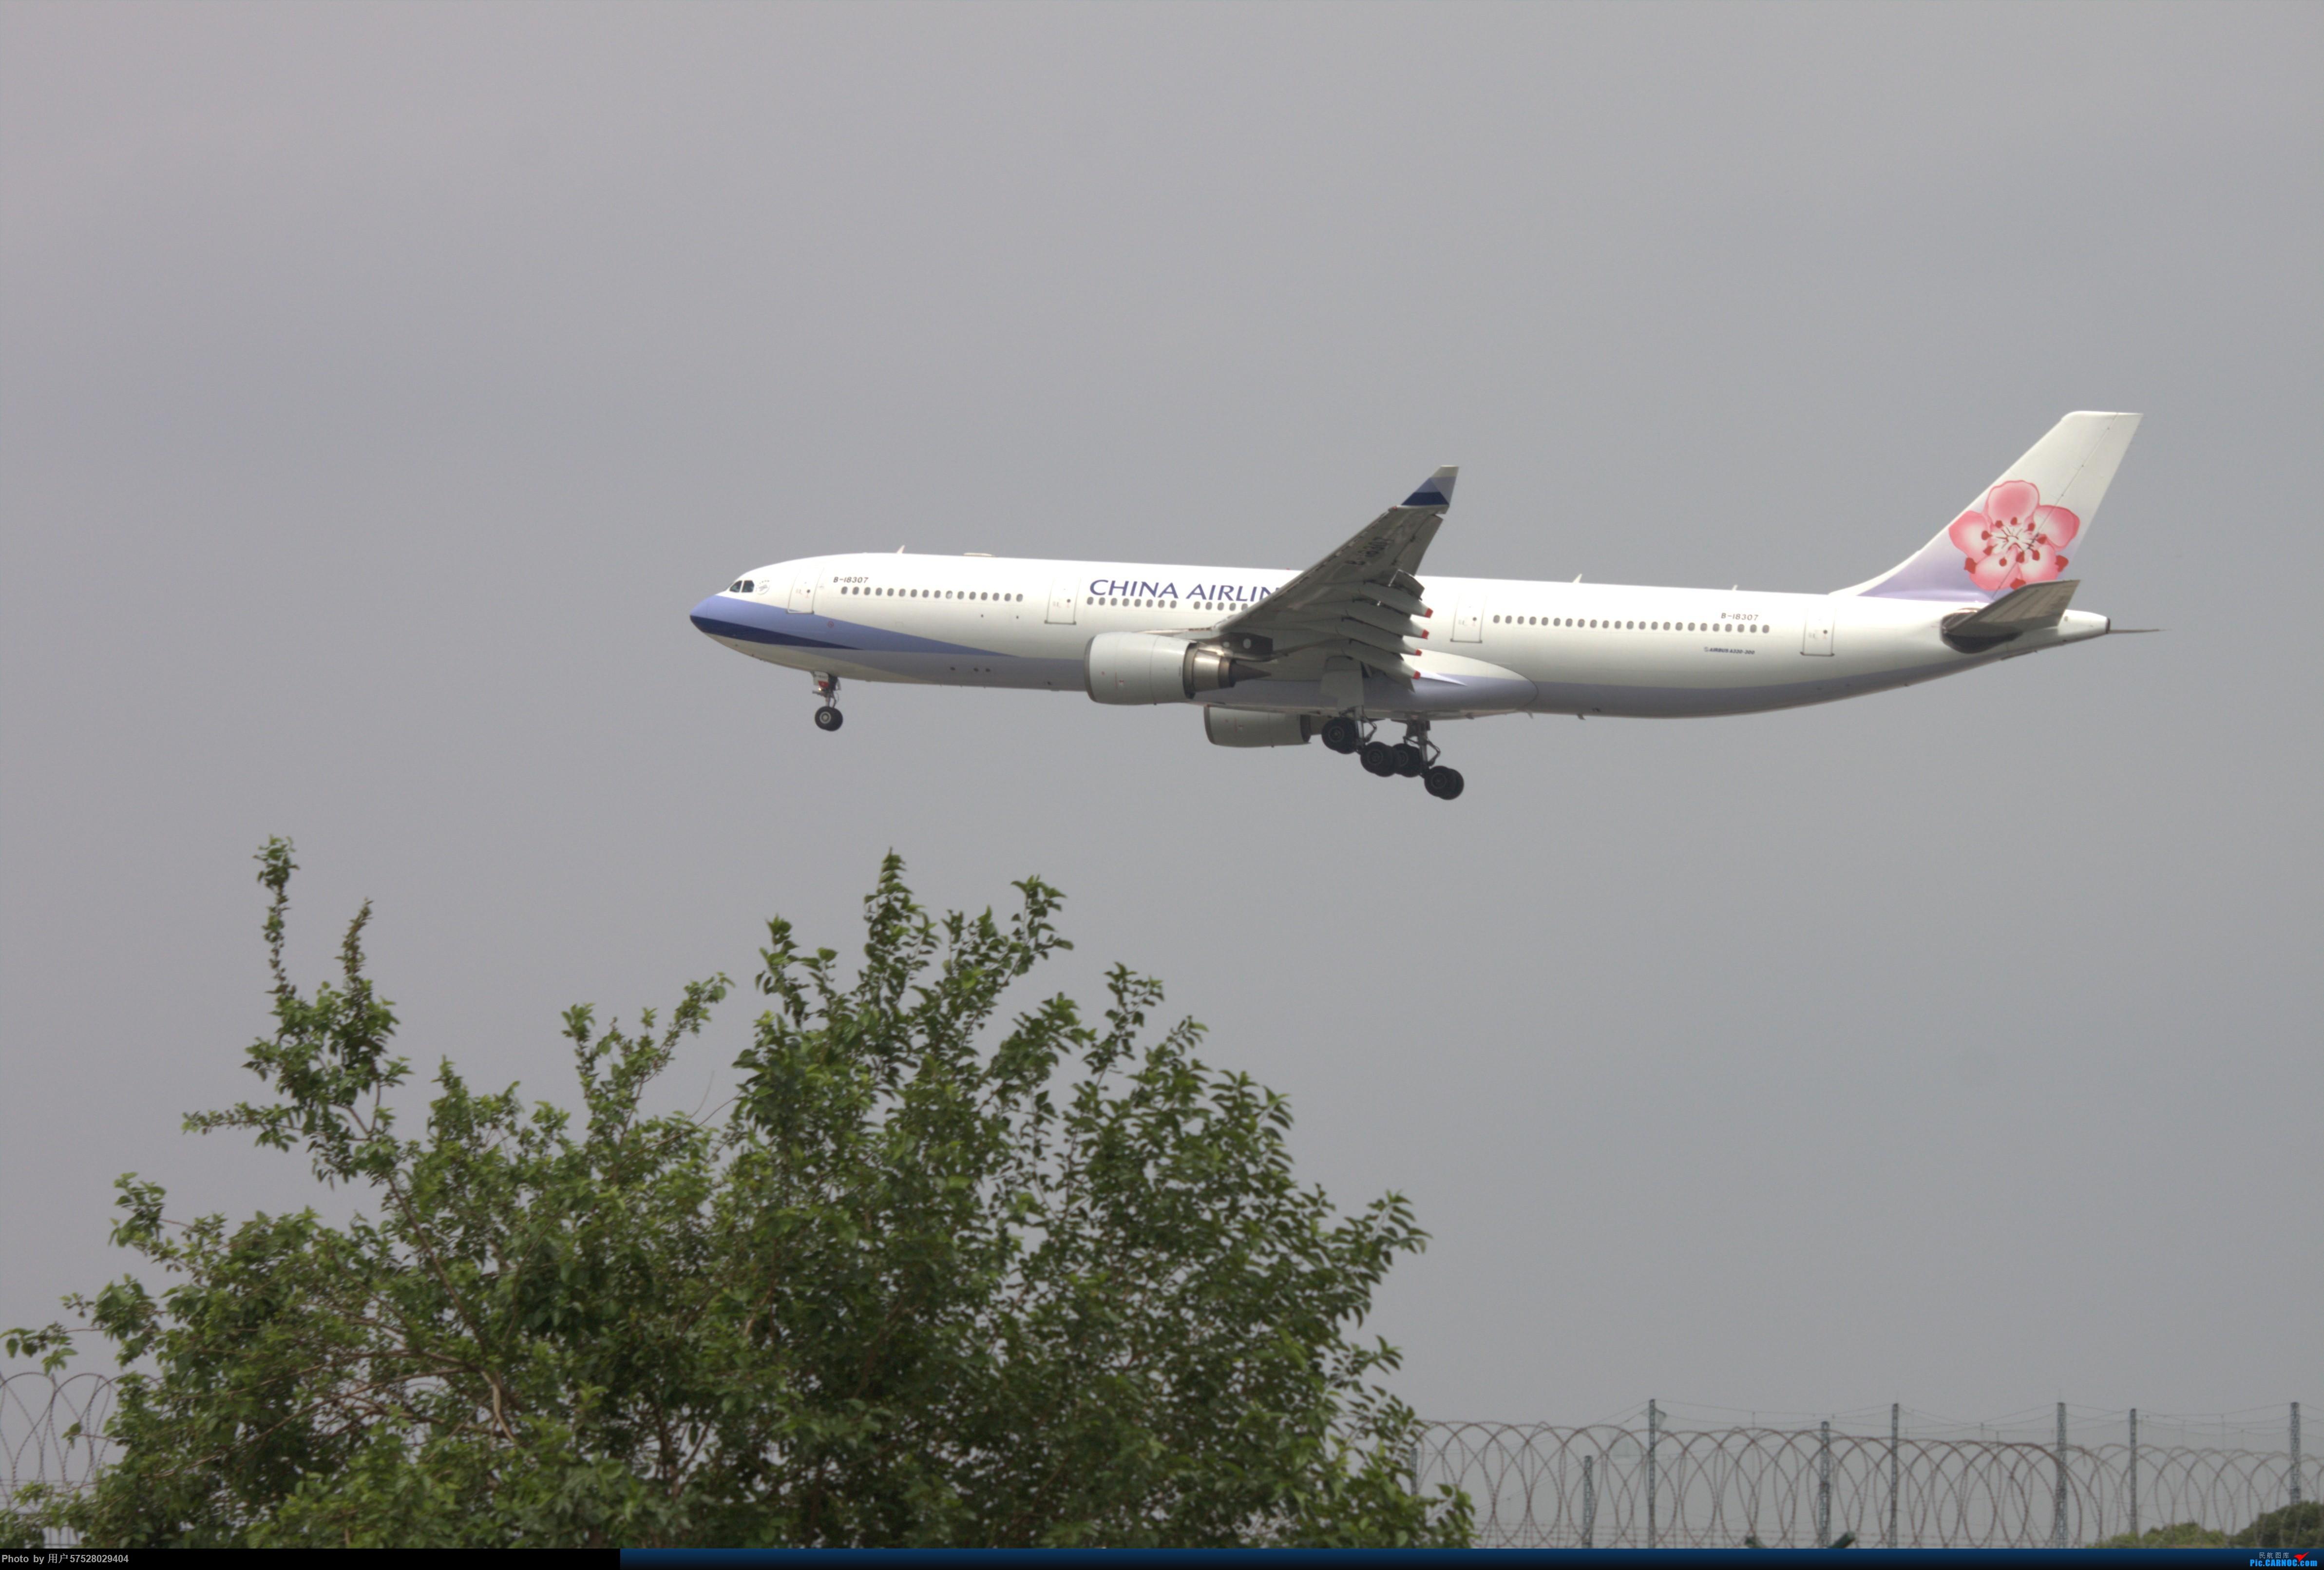 Re:[原创]2018.06.10拍机 AIRBUS A330-300 B-18307 中国上海虹桥国际机场